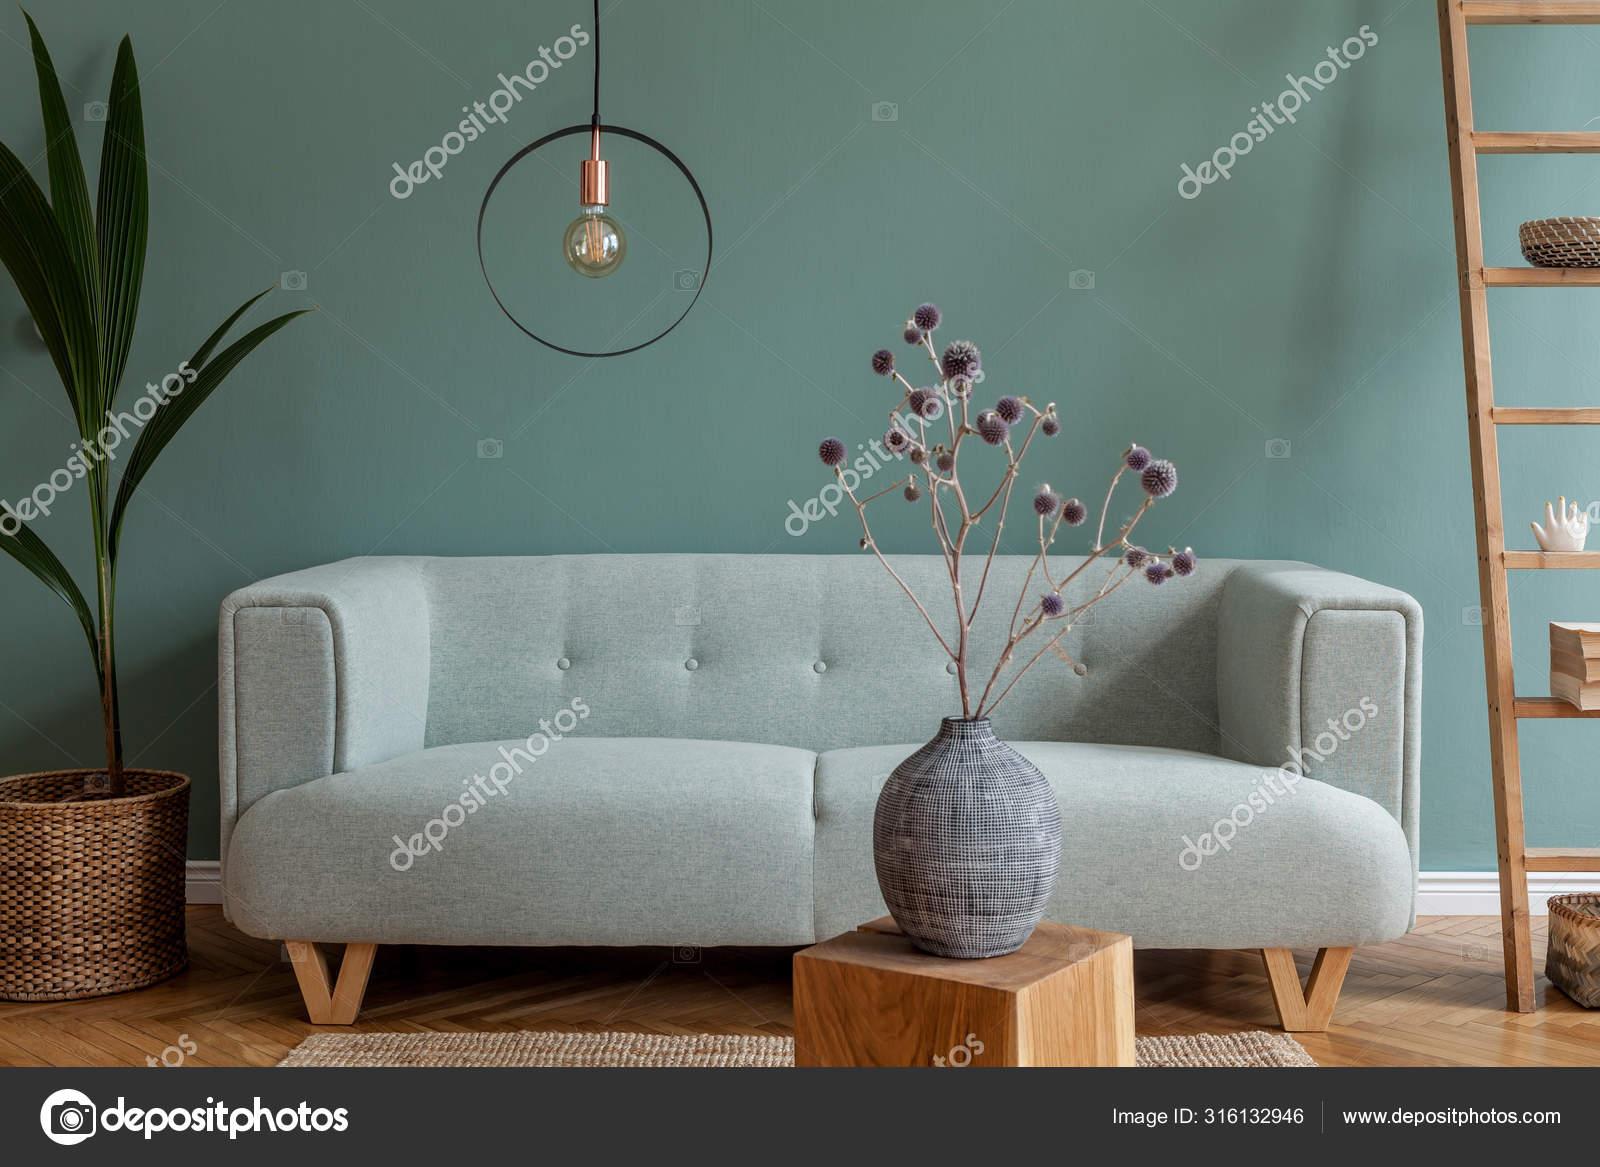 Modern Composition Living Room Interior Apartment Mint Sofa Wooden Ladder Stock Photo C Followtheflow 316132946